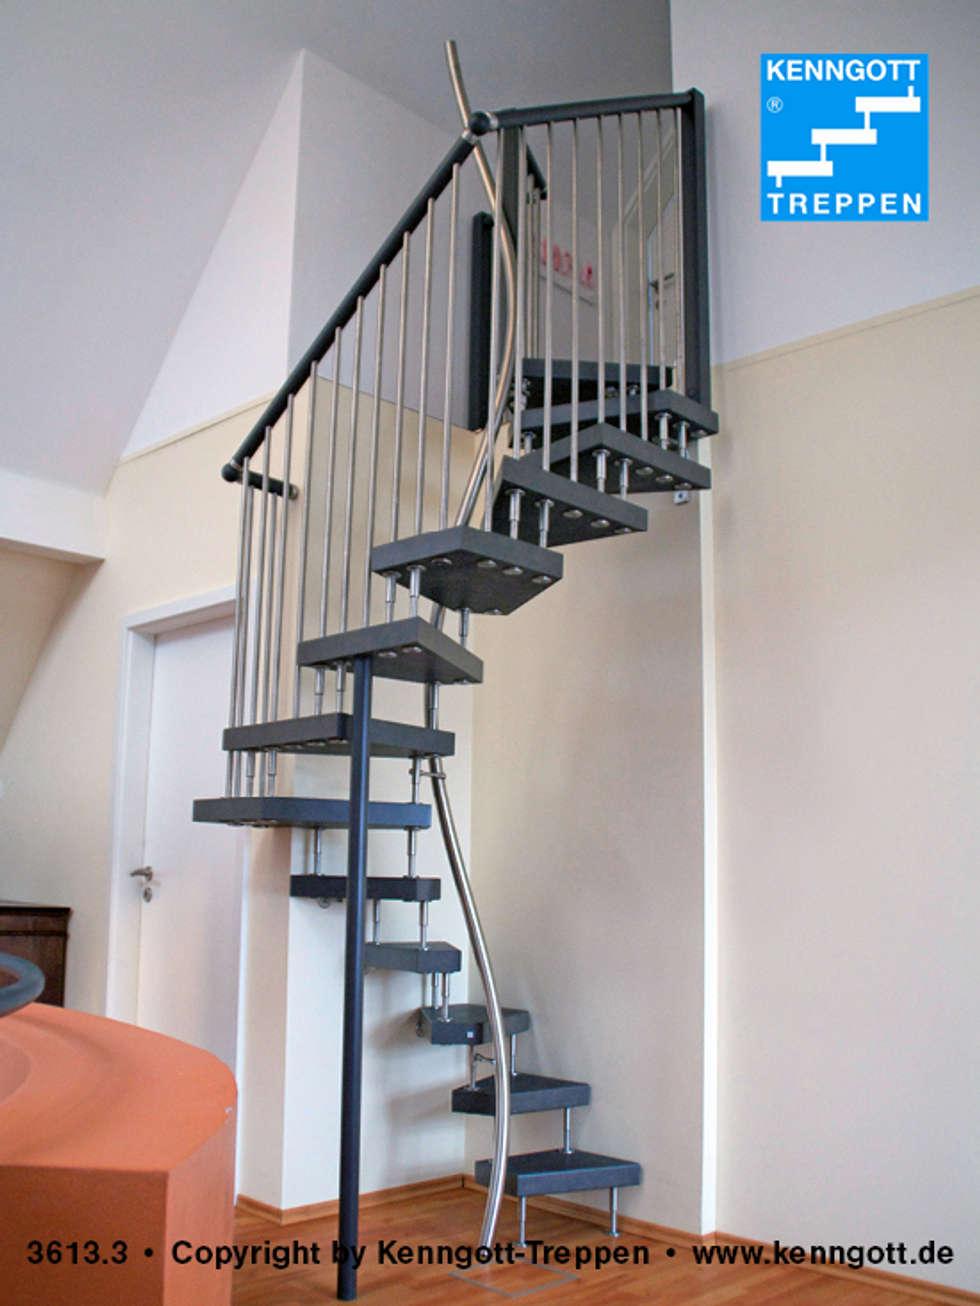 Kenngott Treppen interior design ideas inspiration pictures homify